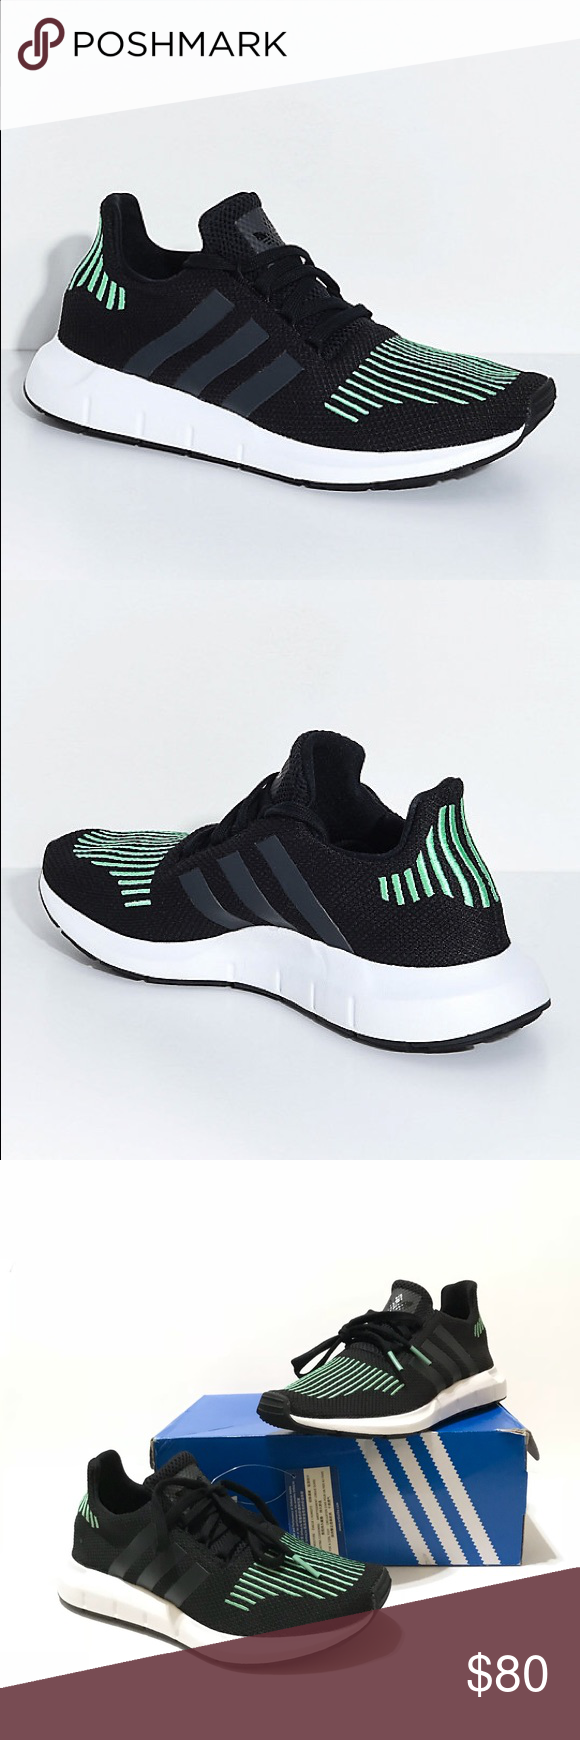 ditta adidas swift run black and white shoes nwt pinterest